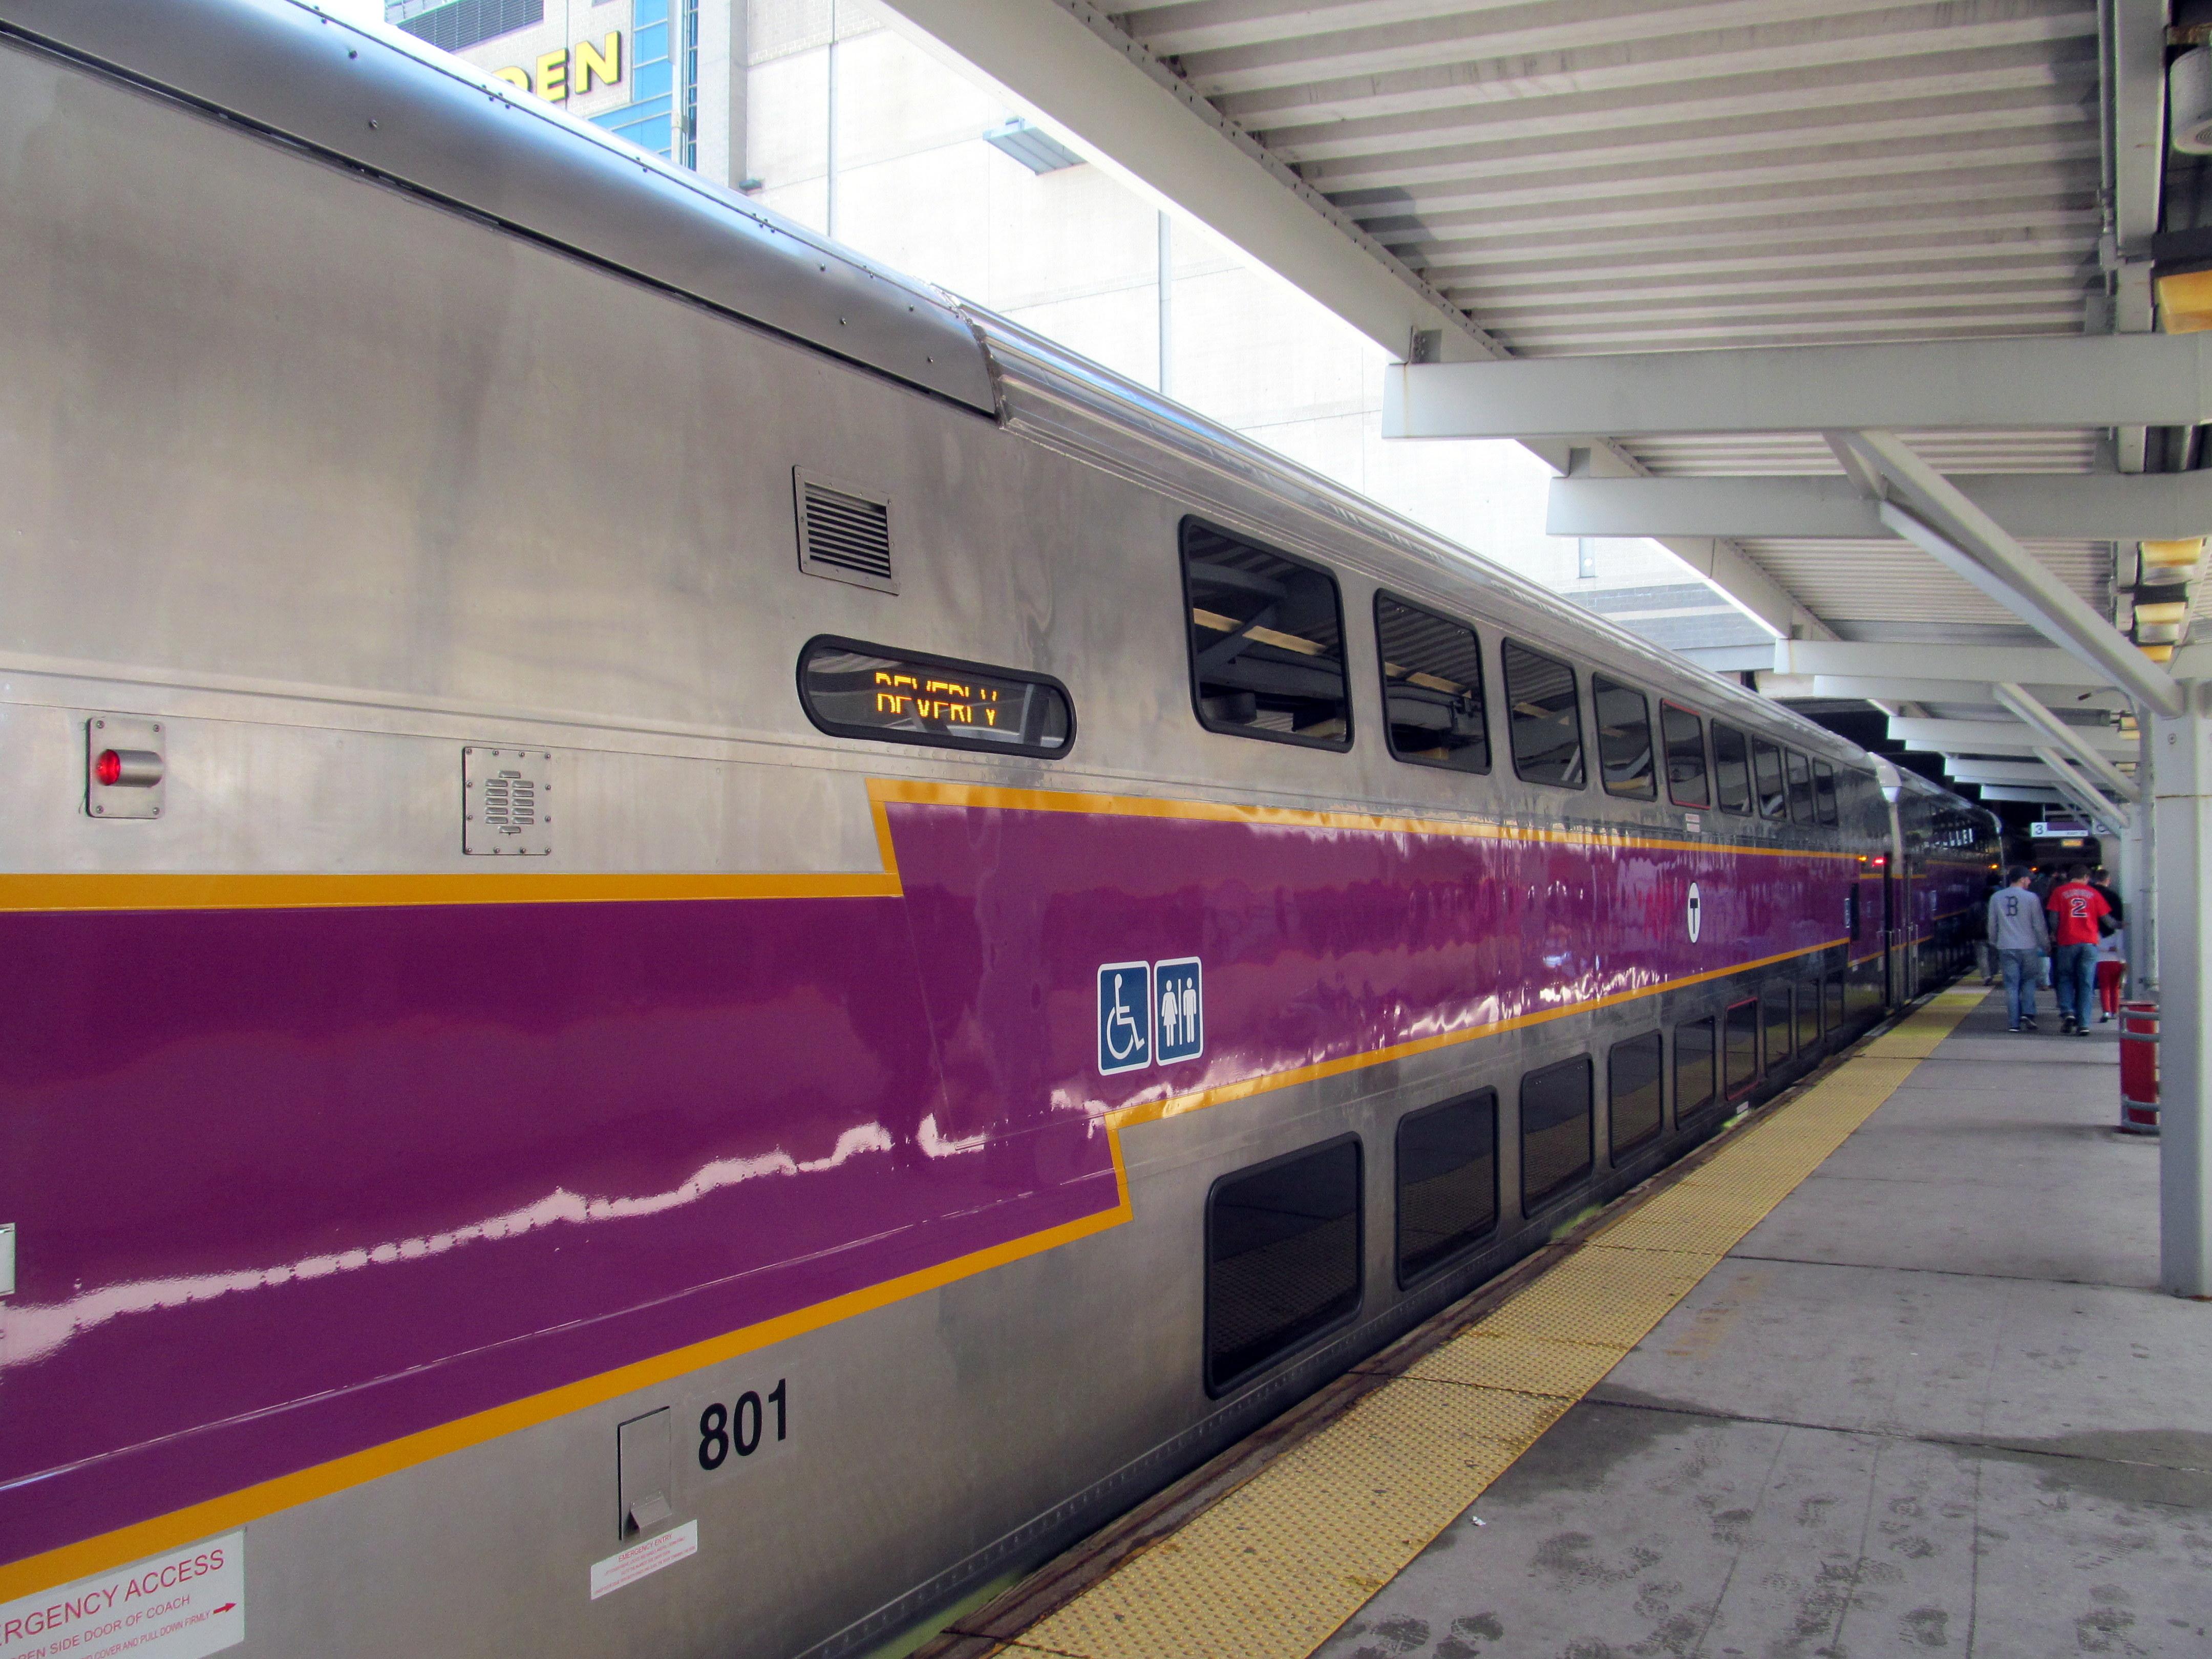 A Hyundai-Rotem double-decker train for MBTA